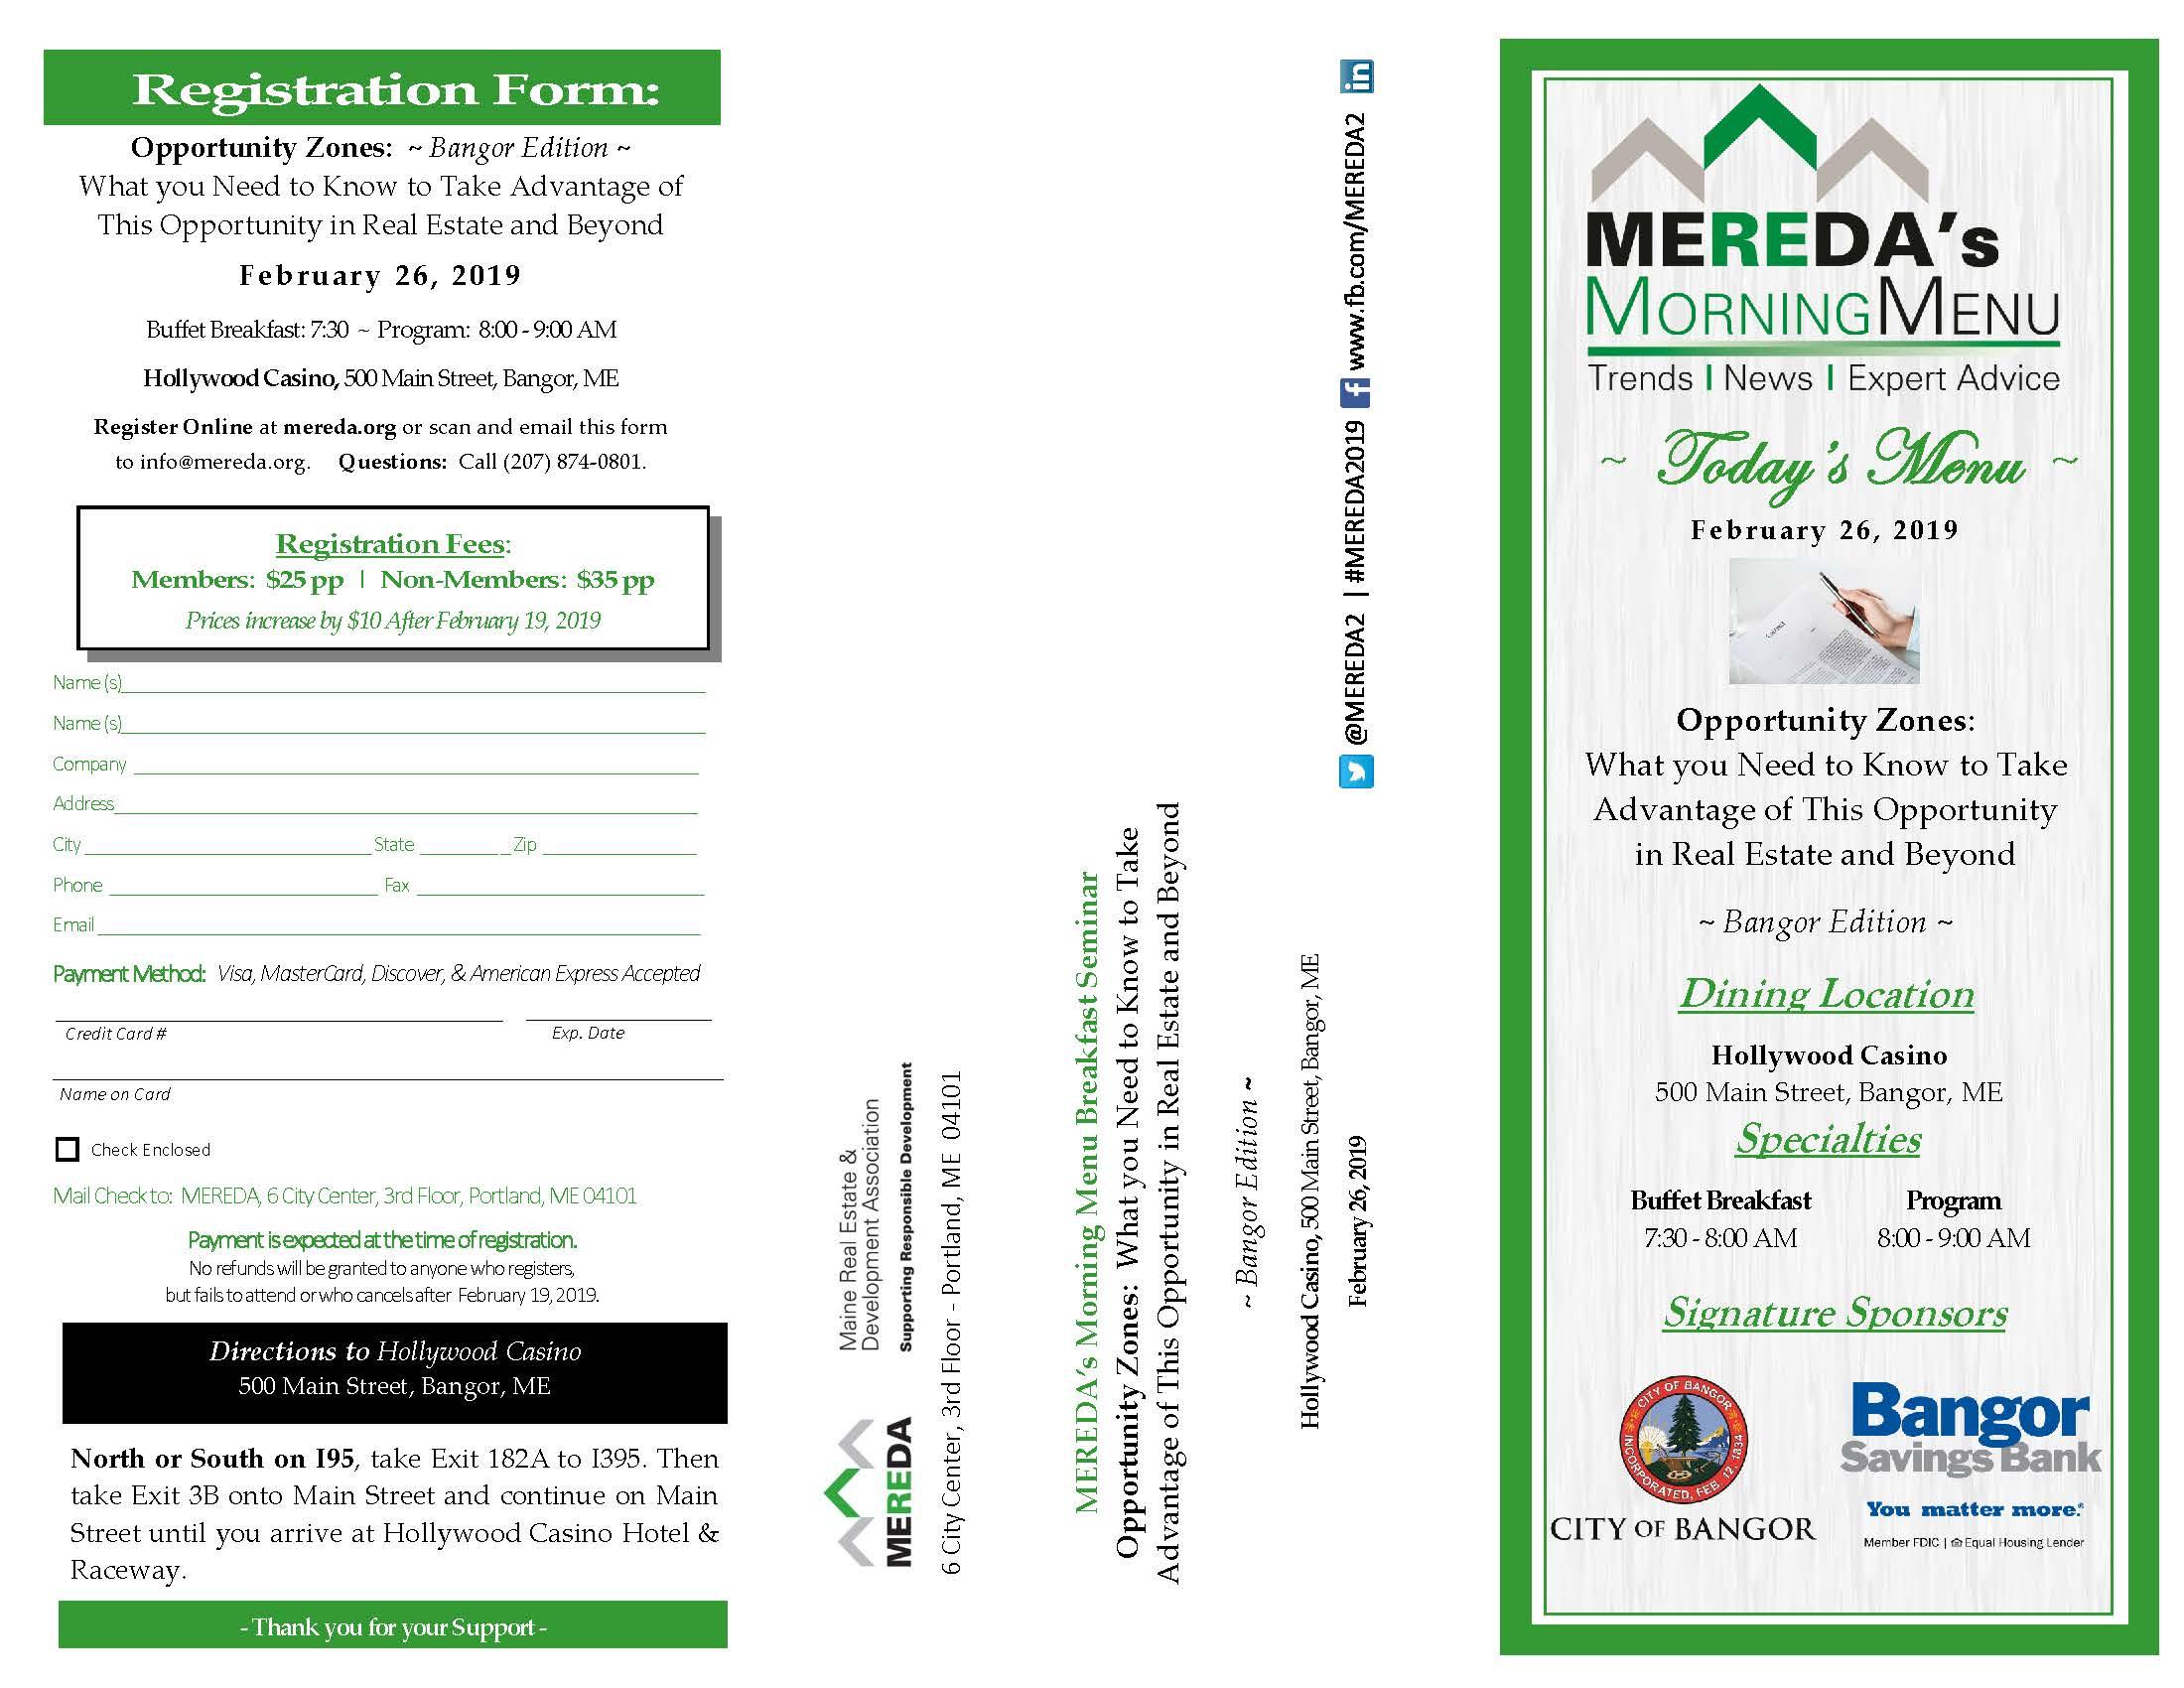 Event Mailer BGR 2-26-19